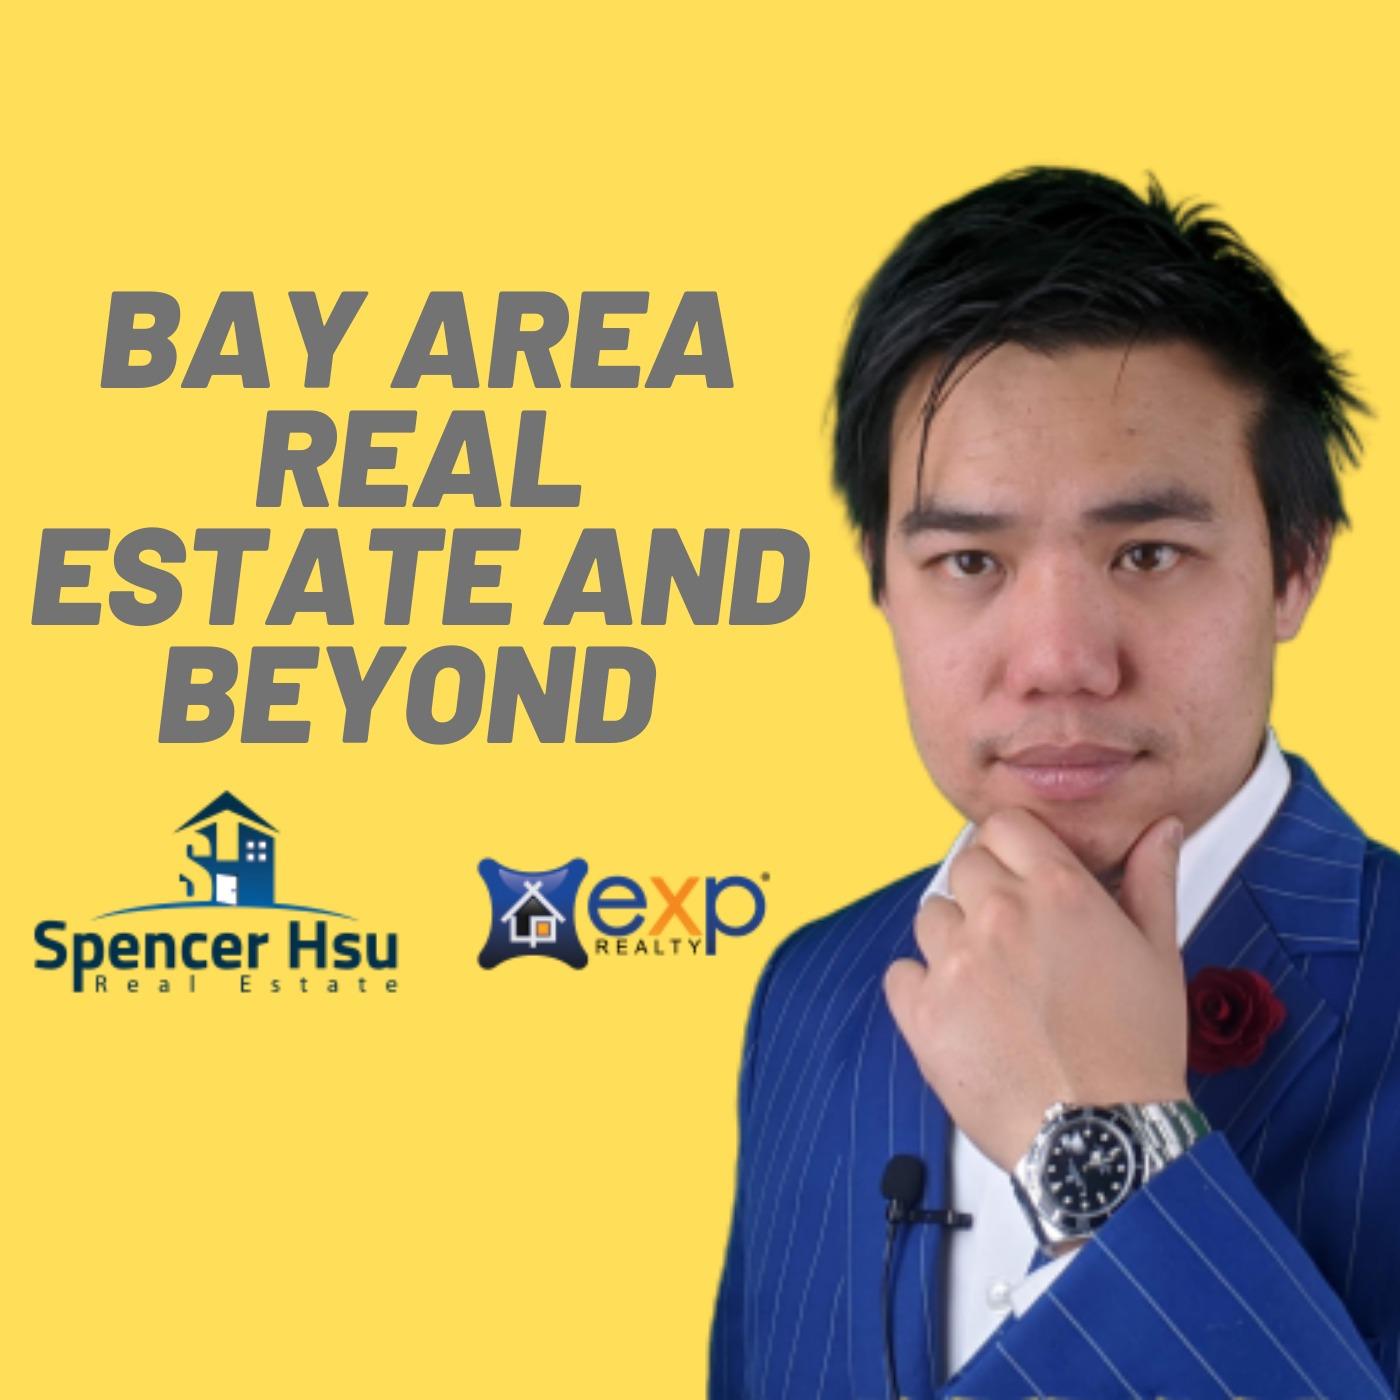 Bay Area Real Estate and Beyond | MBA Tech Realtor Spencer Hsu